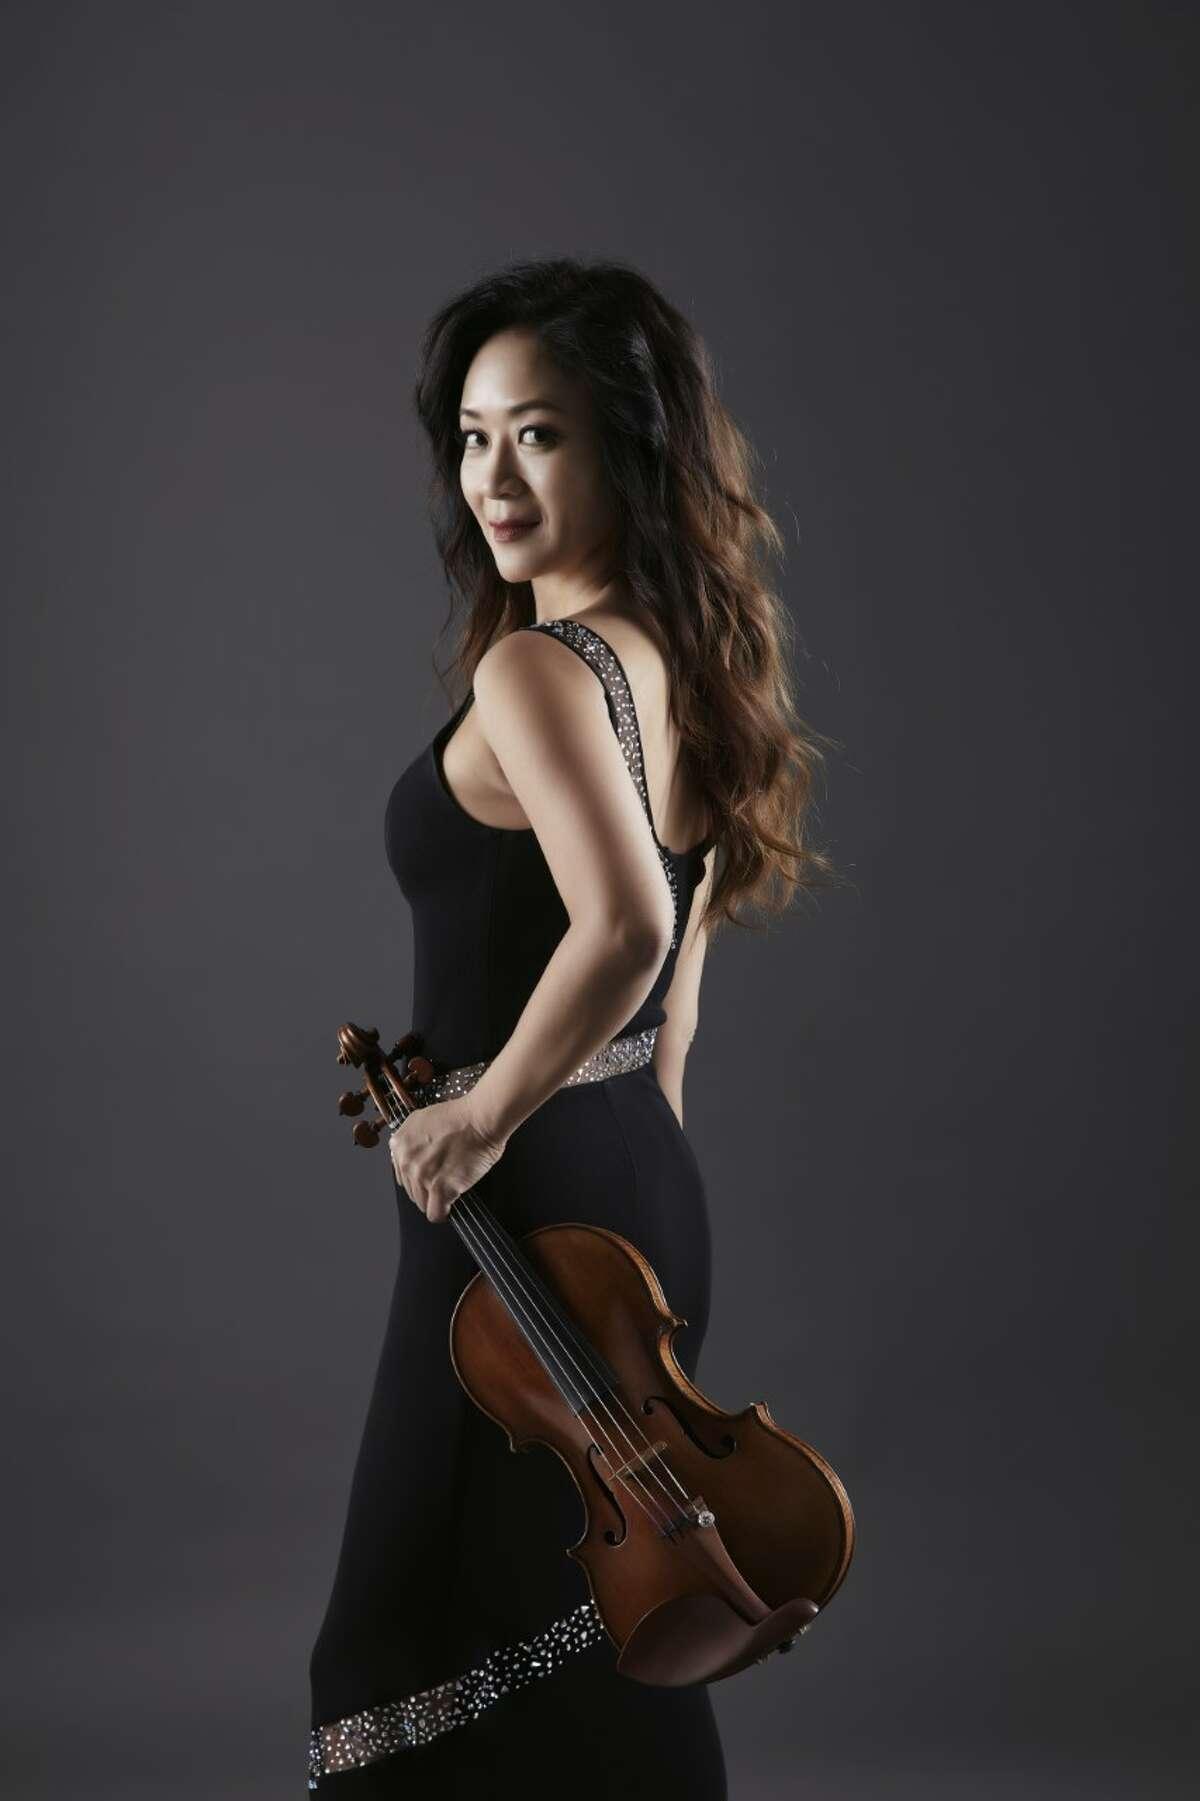 Violinist Chee-Yun.